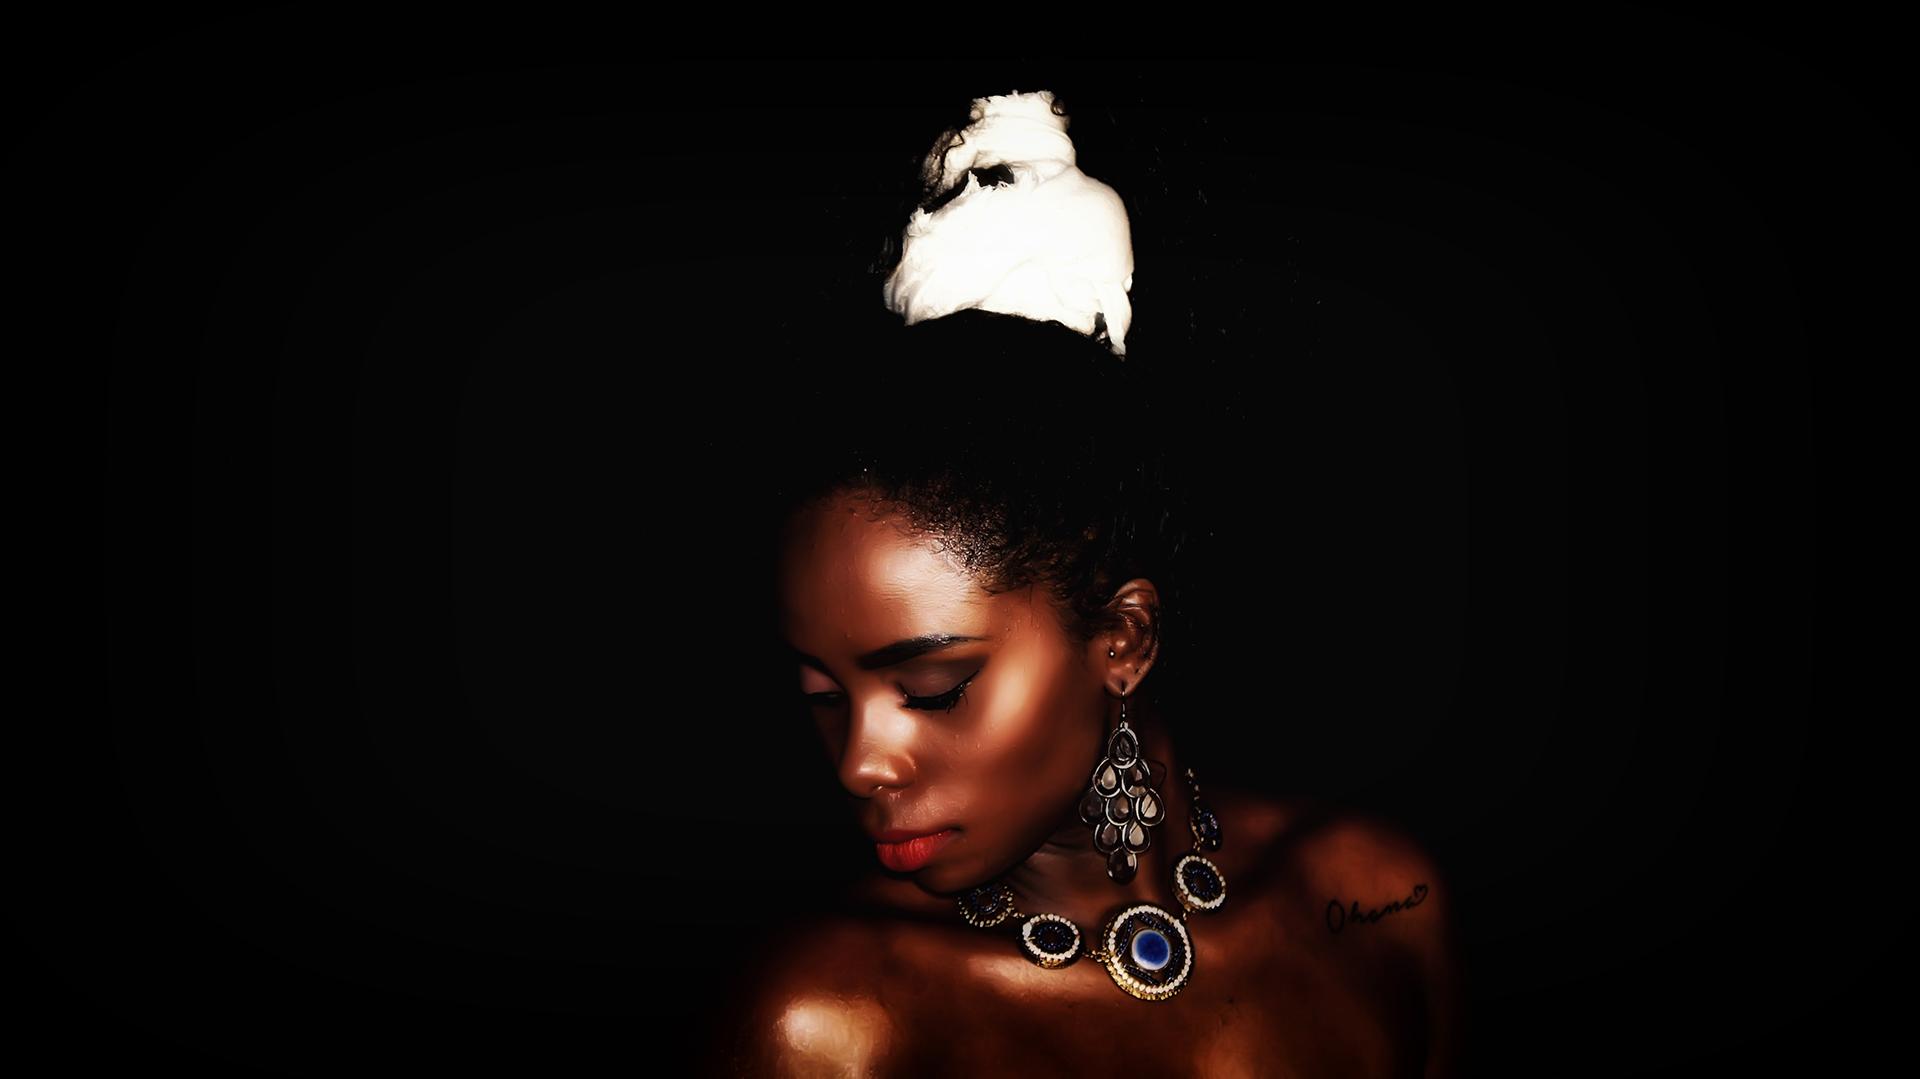 foto @marcioblackfoto modelo @gabrielaviana